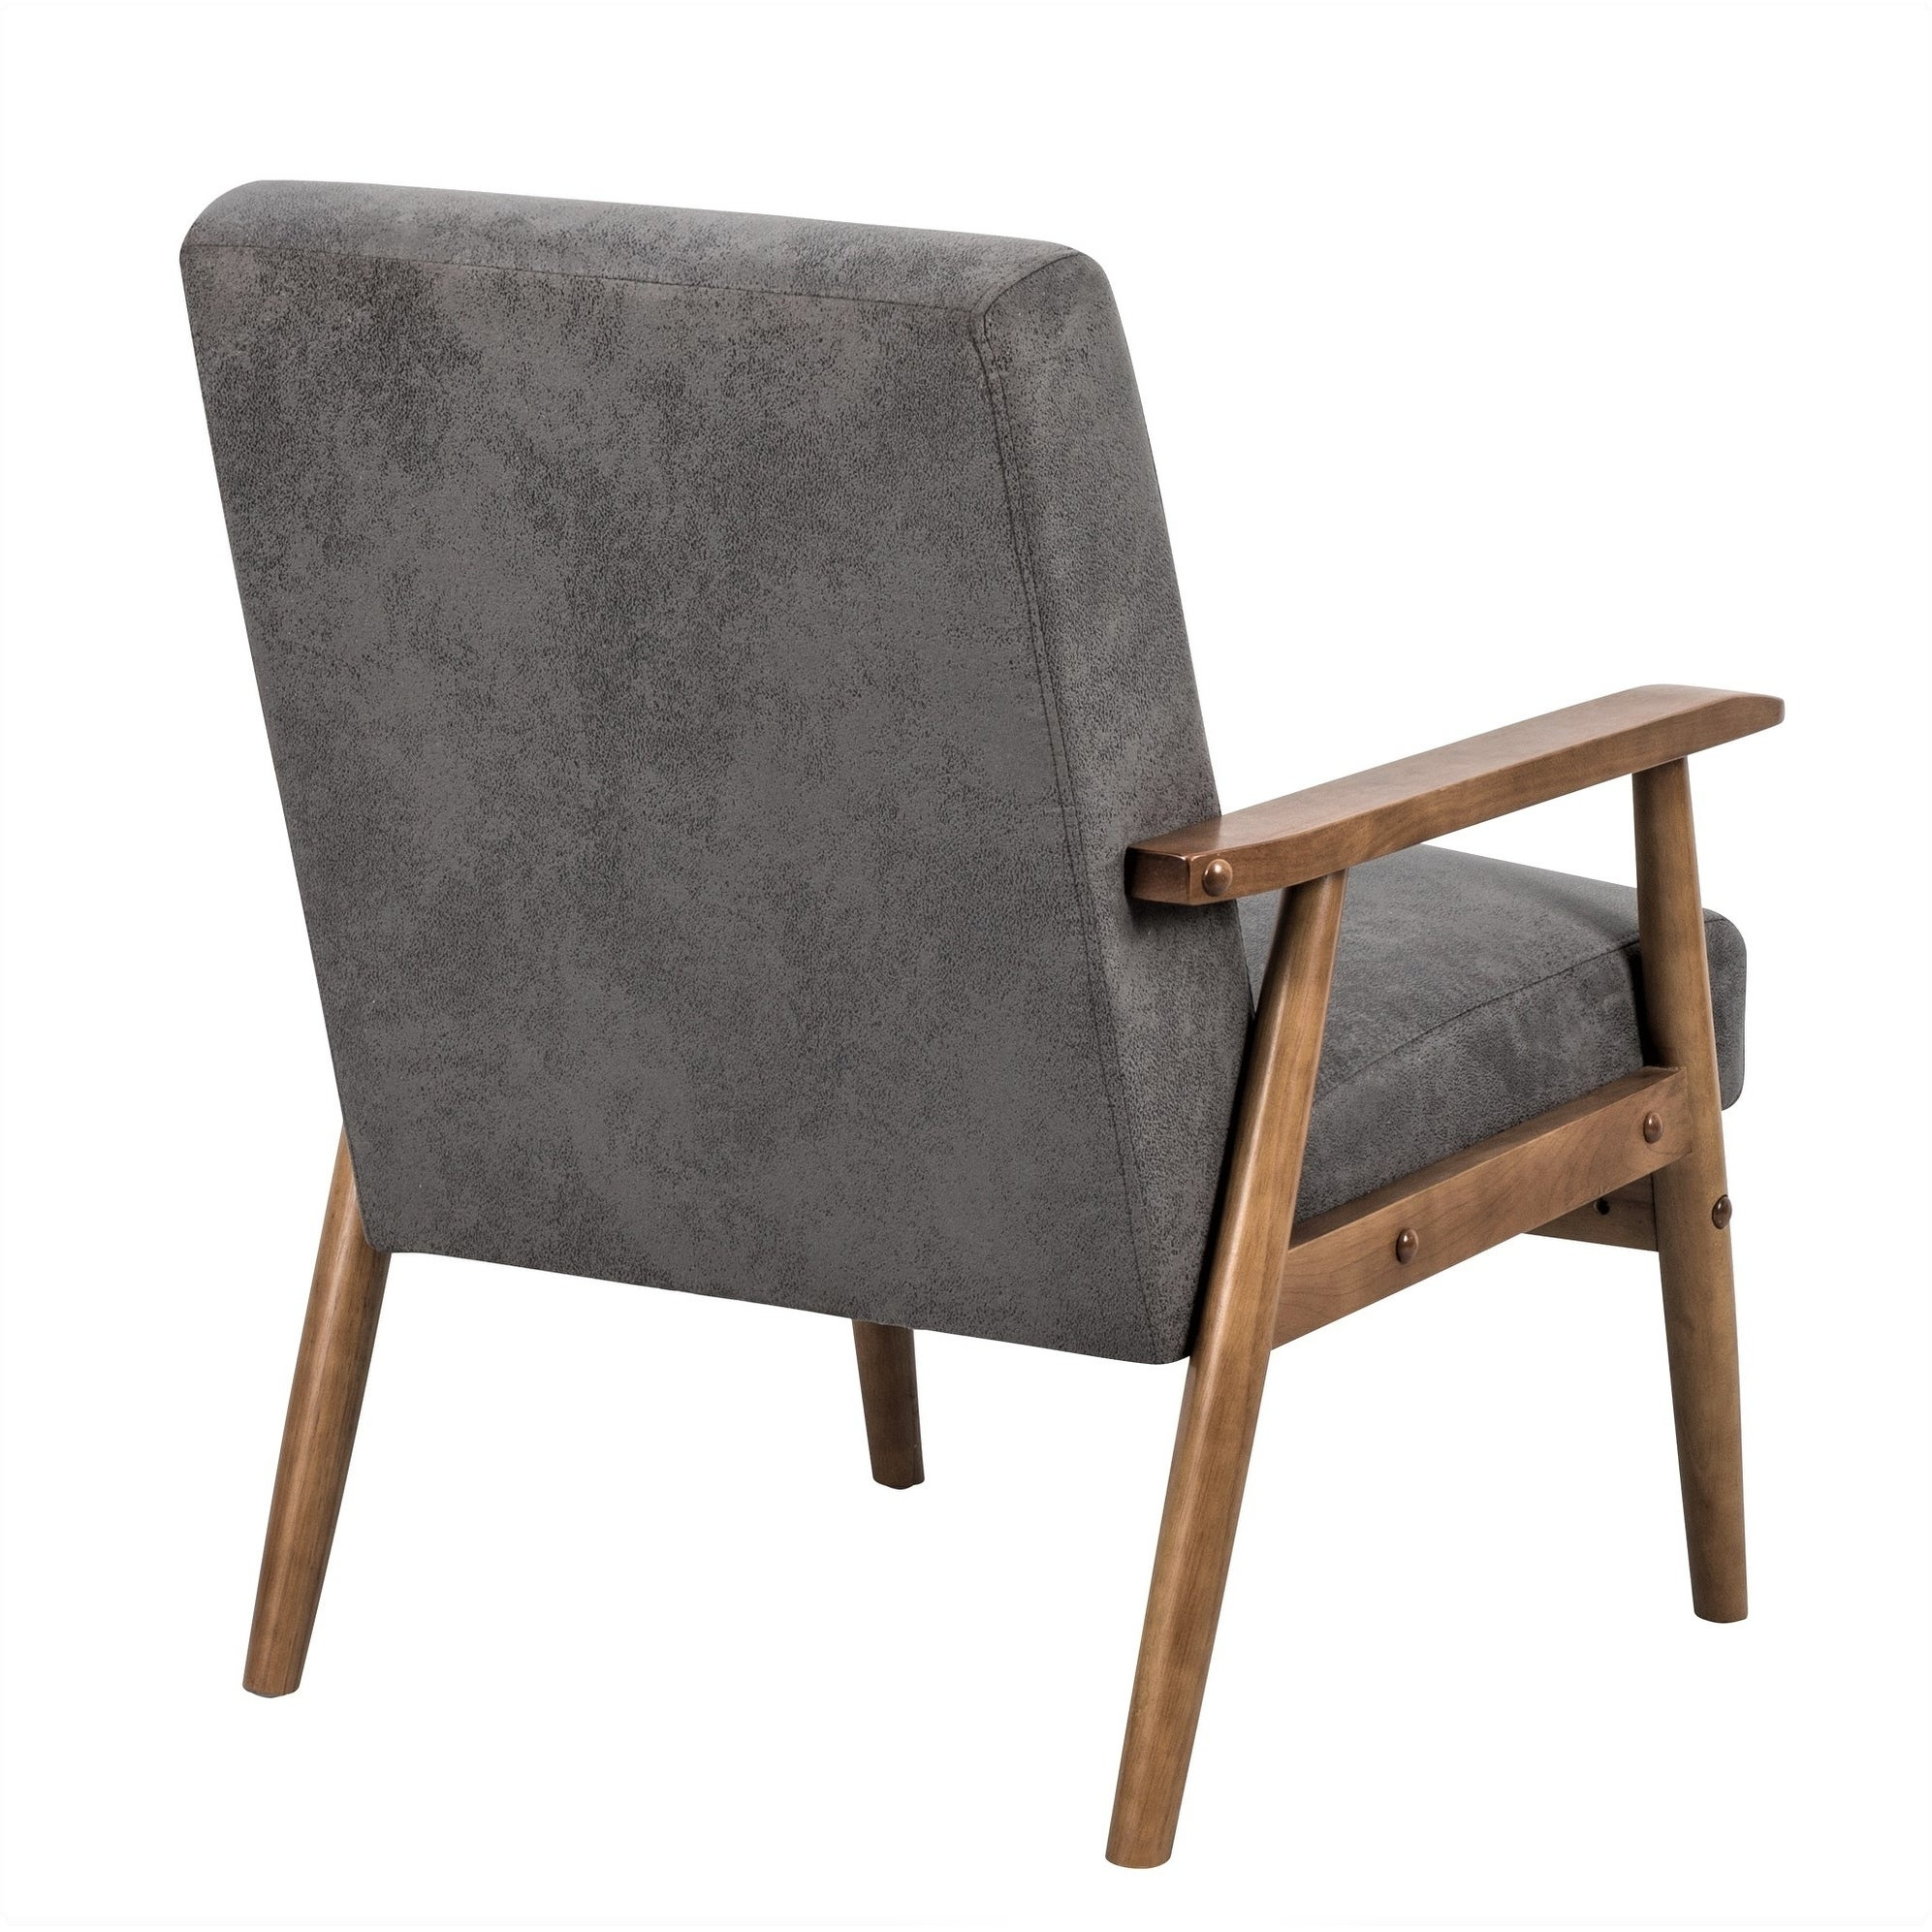 "Beachwood 21"" Arm Chair Pertaining To Beachwood Arm Chairs (View 4 of 15)"